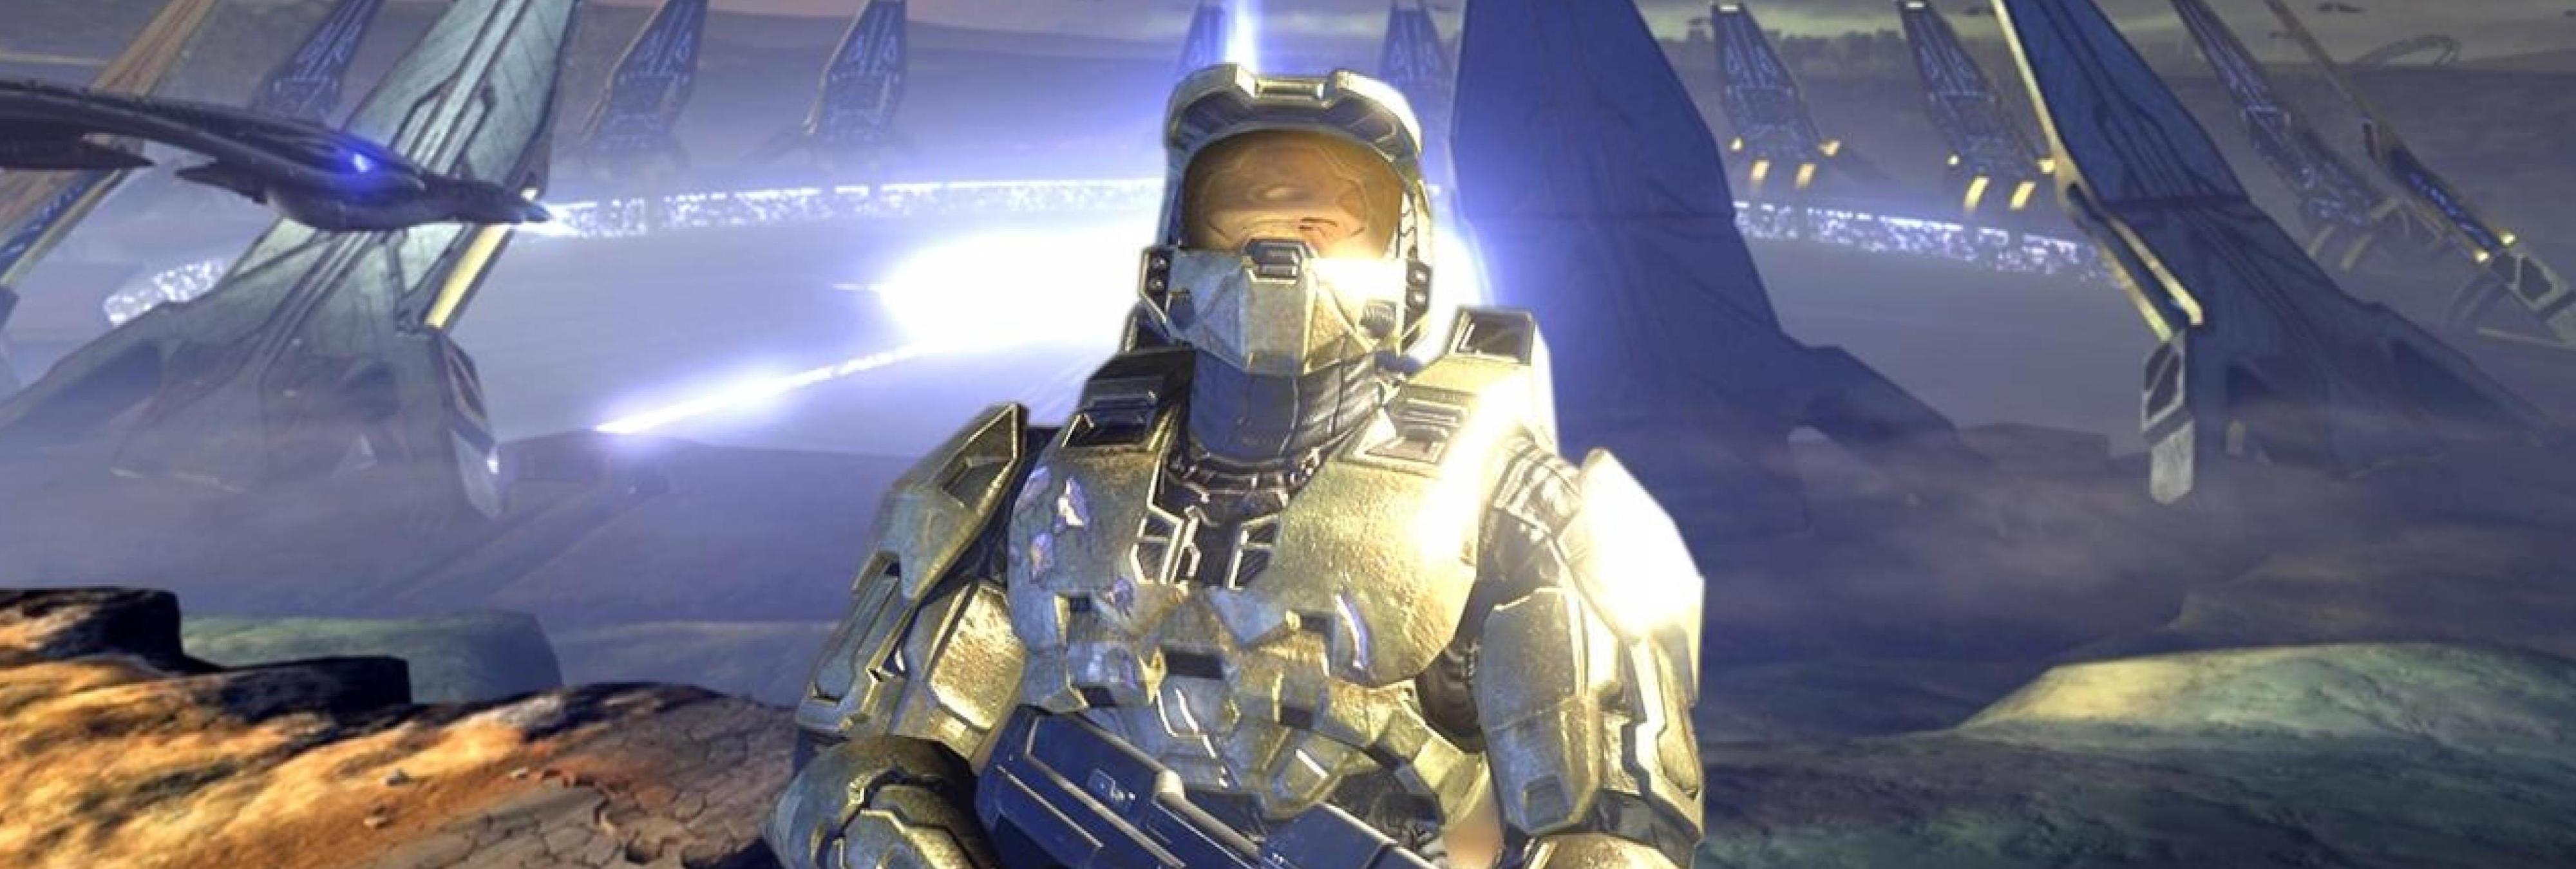 5 juegos imprescindibles que nos dejó Xbox 360